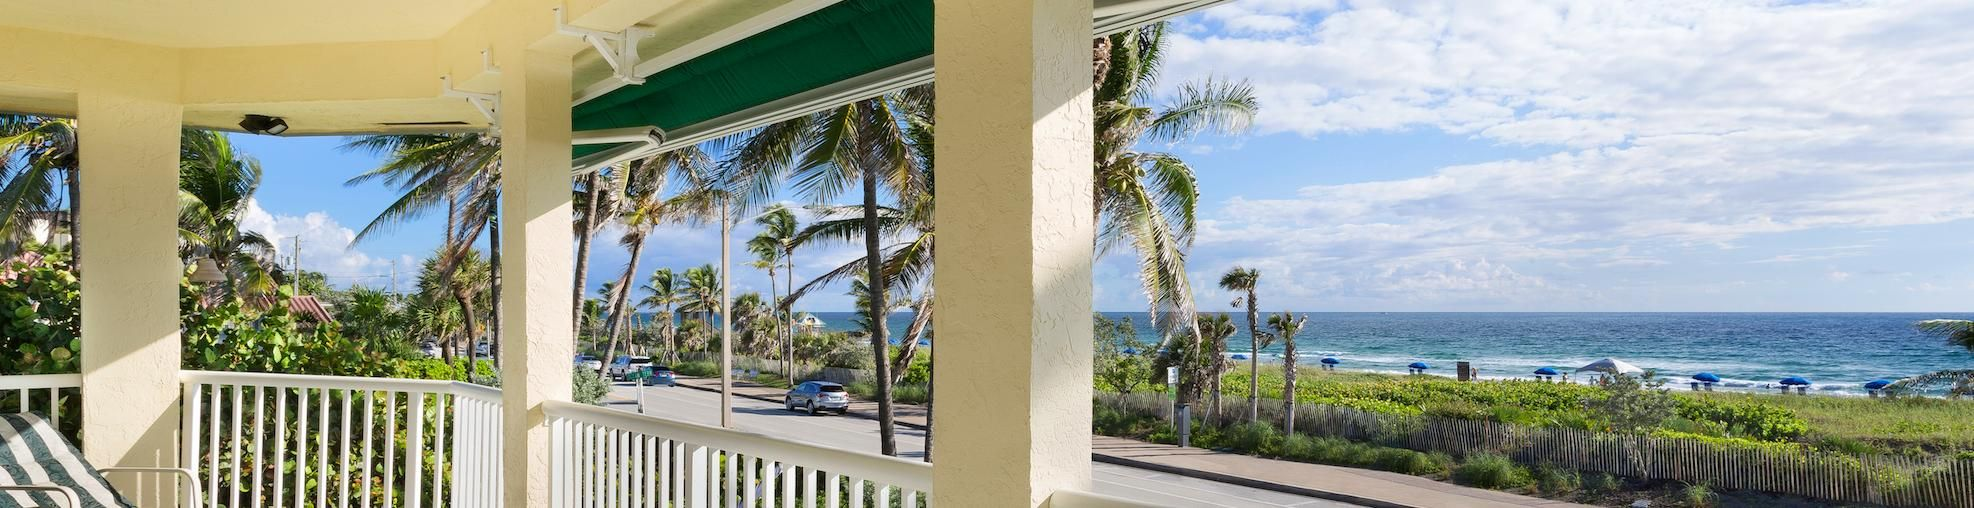 220 South Ocean Boulevard Delray Beach, FL 33483 photo 7